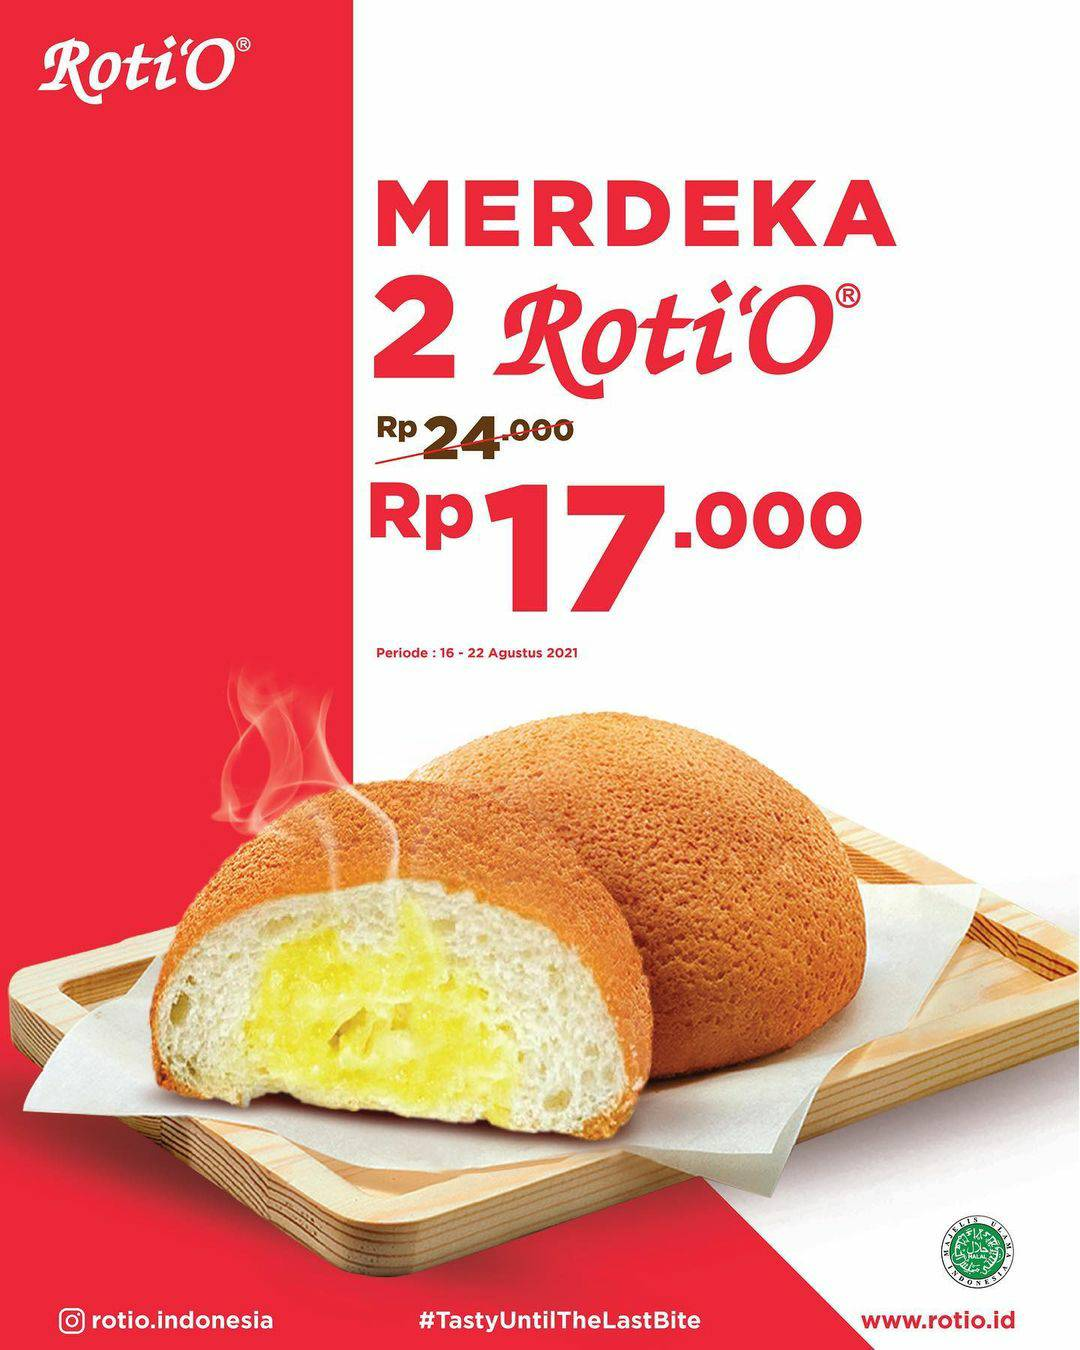 Promo Roti O Merdeka - Beli 2 Rotio harga hanya Rp. 17.000